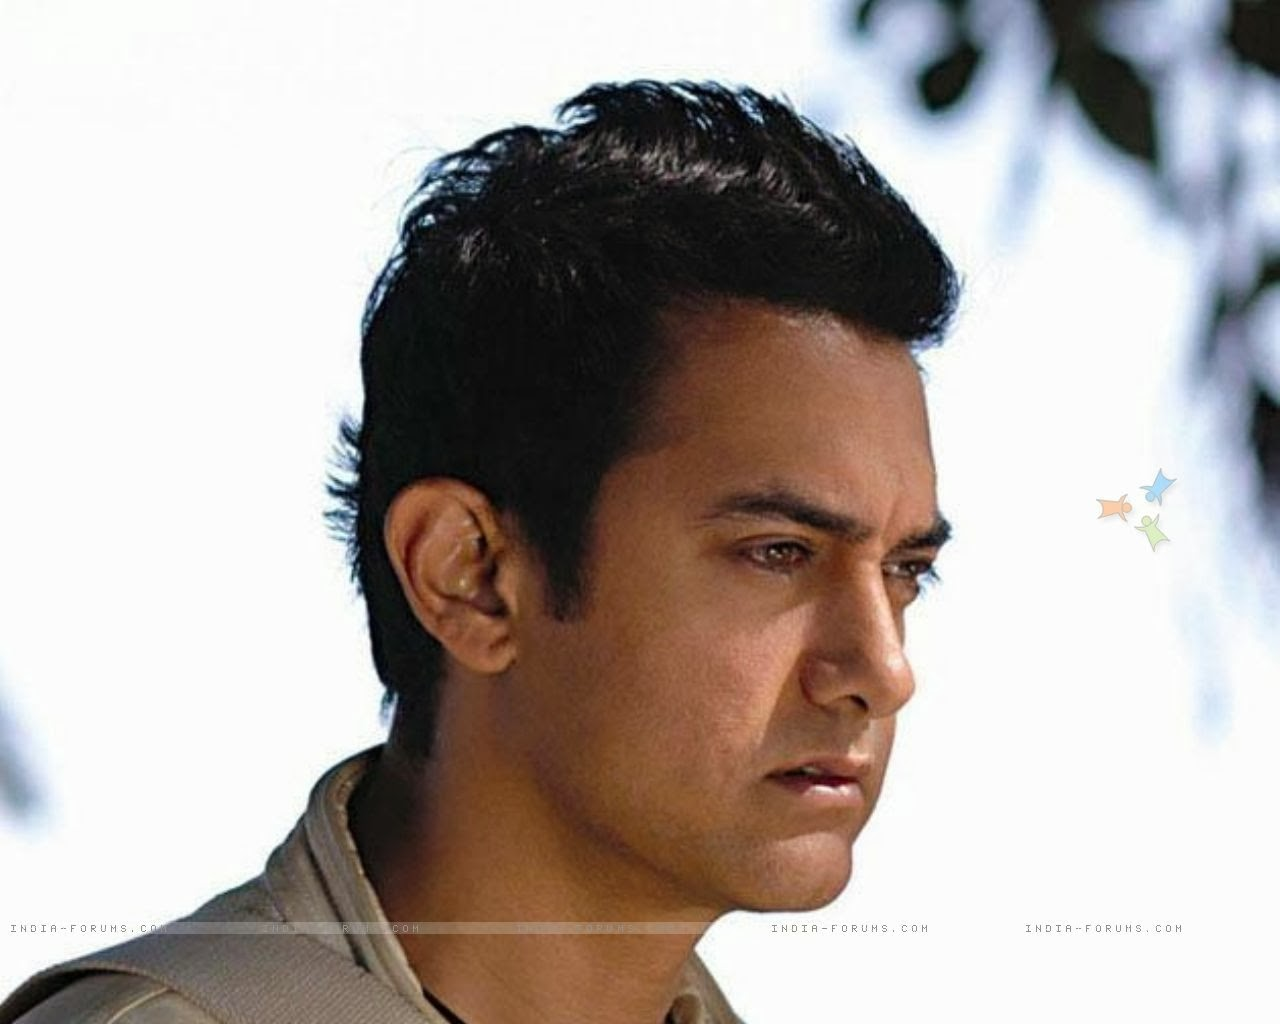 Aamir Khan Pic Download: World Actor Image: Aamir Khan Images